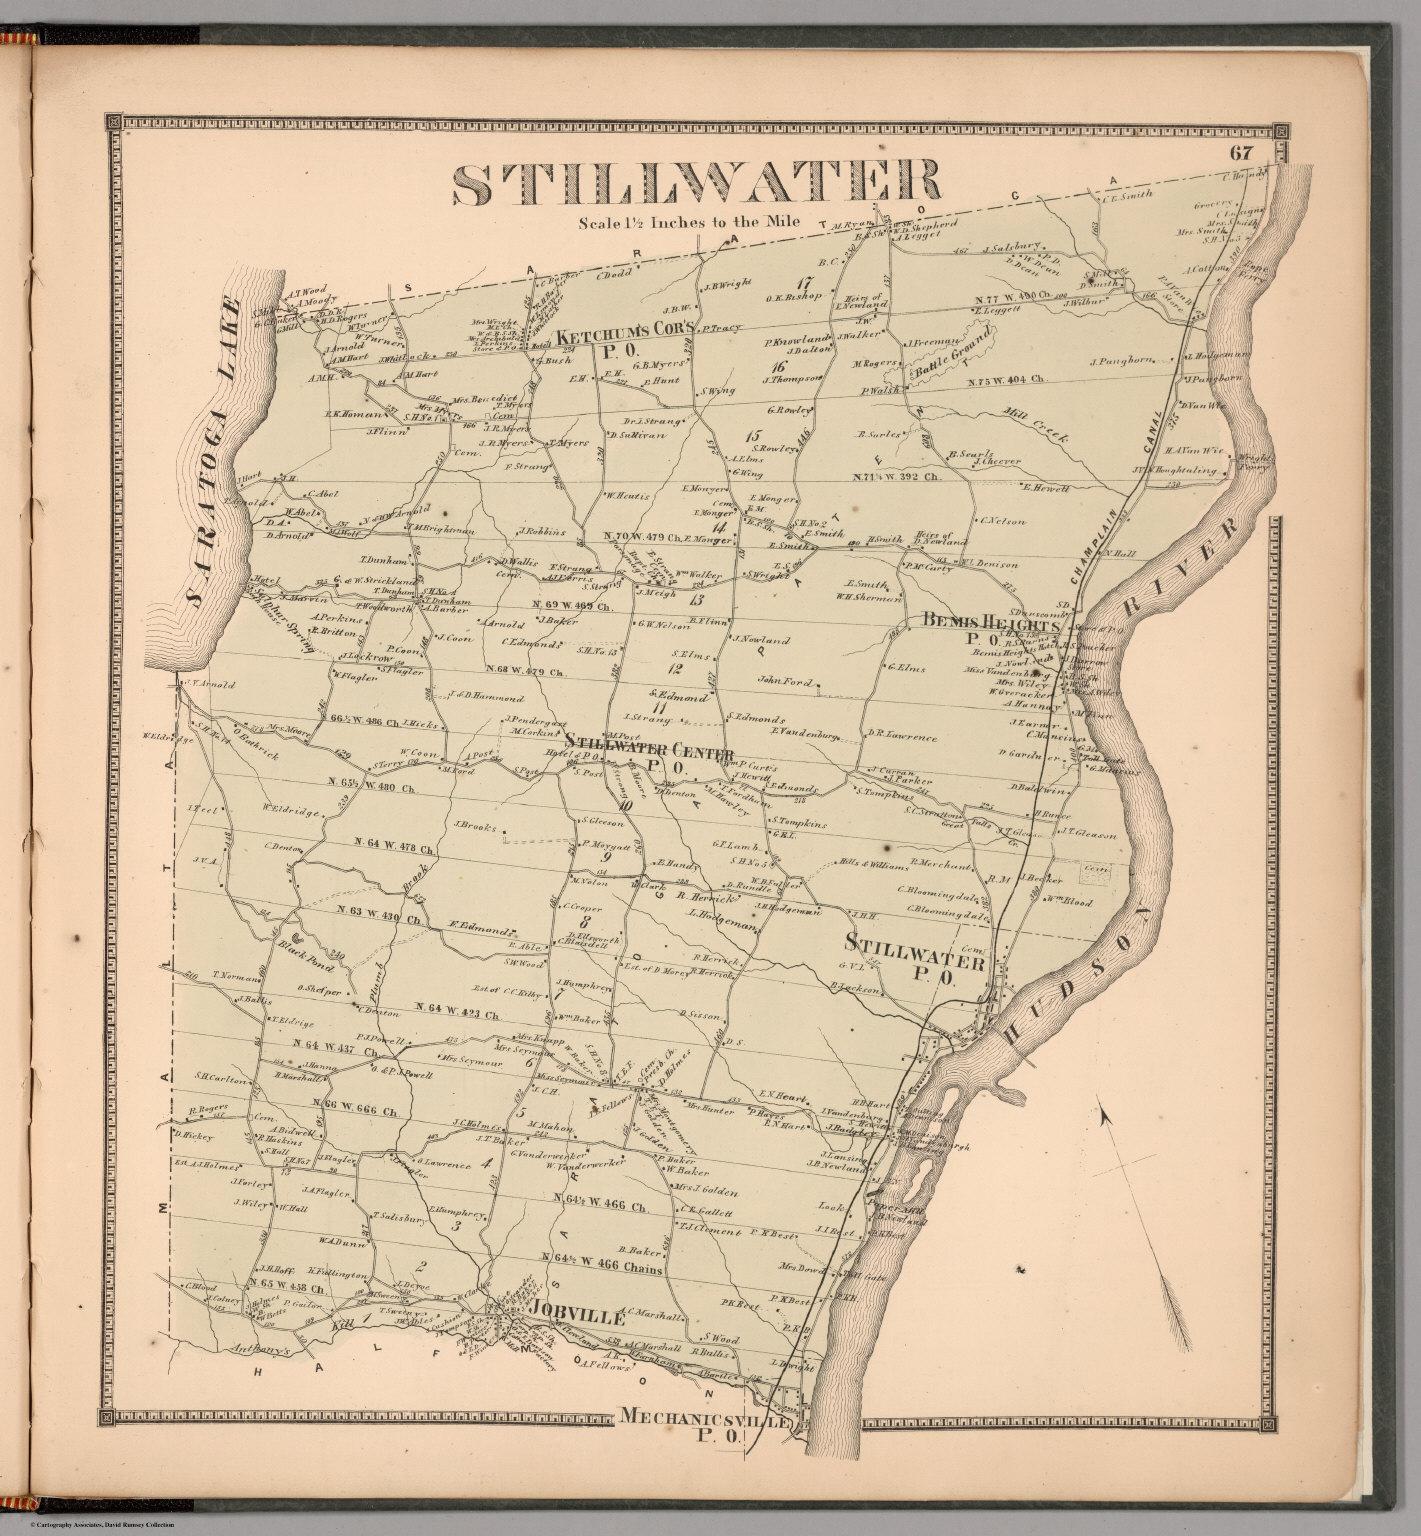 Saratoga New York Map.Stillwater Saratoga County New York David Rumsey Historical Map